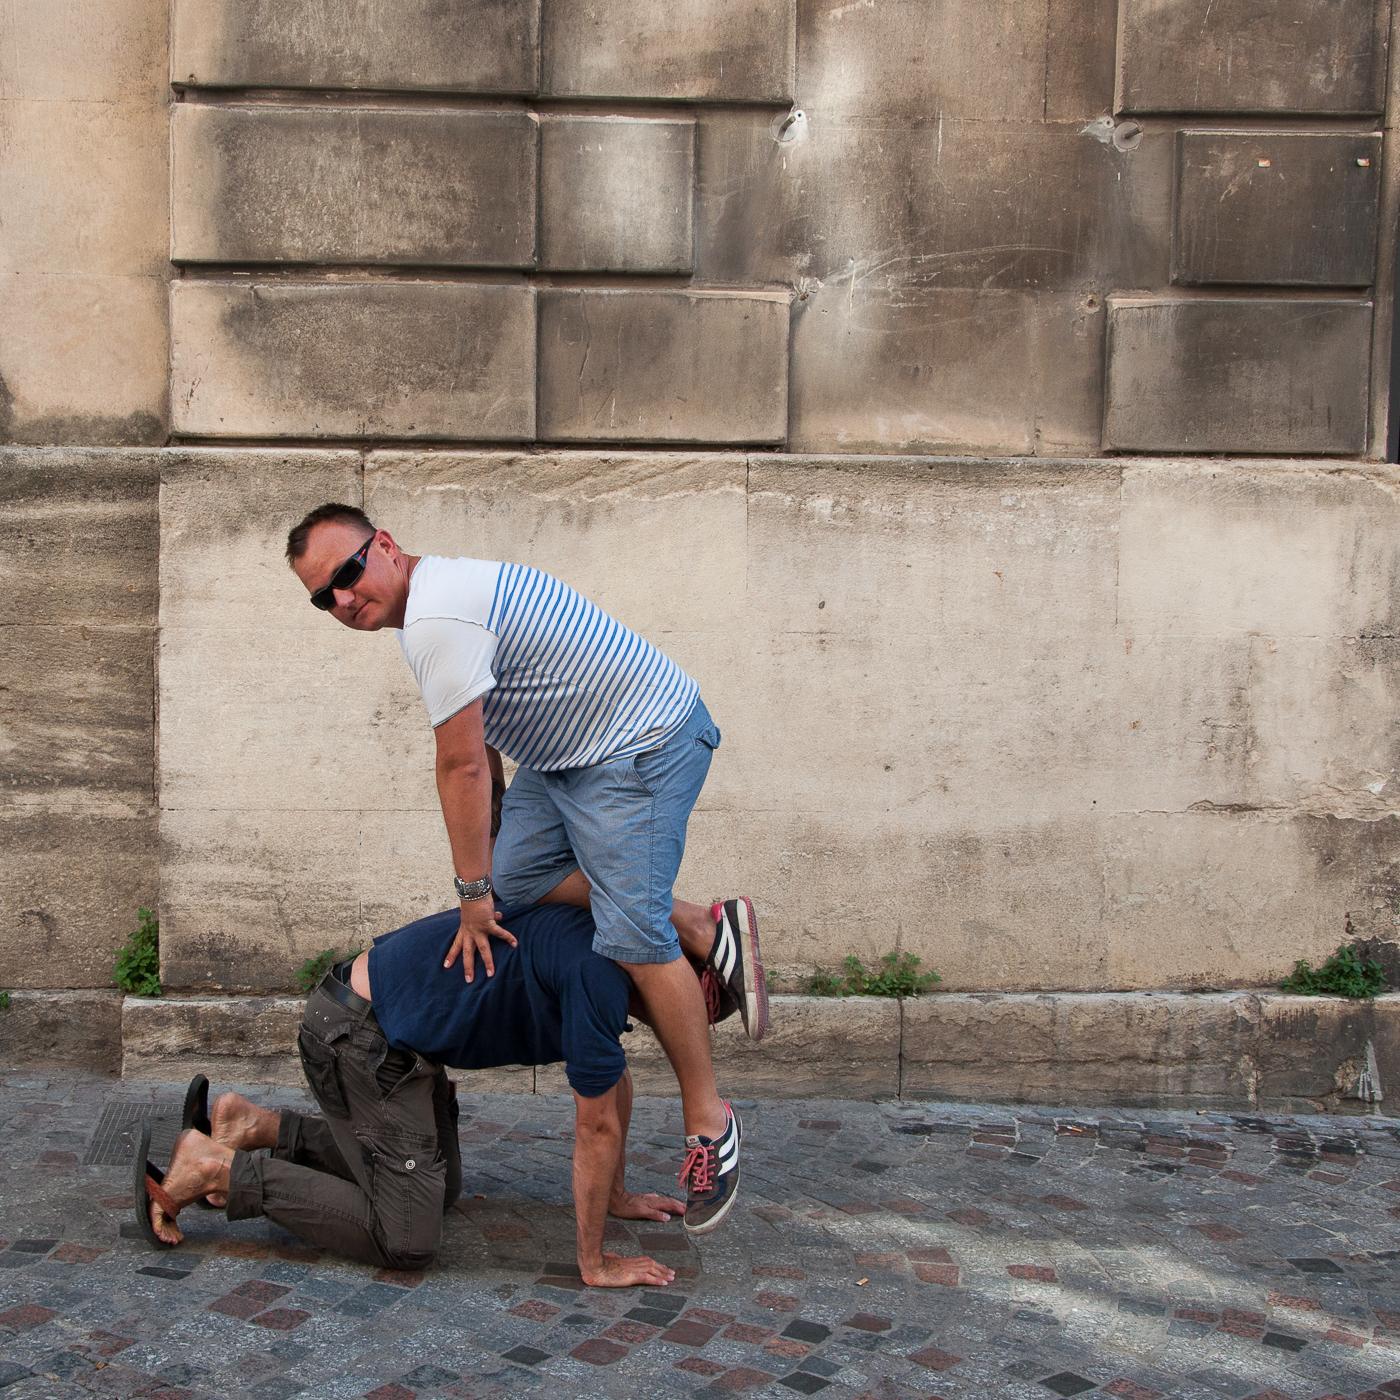 Arles 2015 - Avec prudence